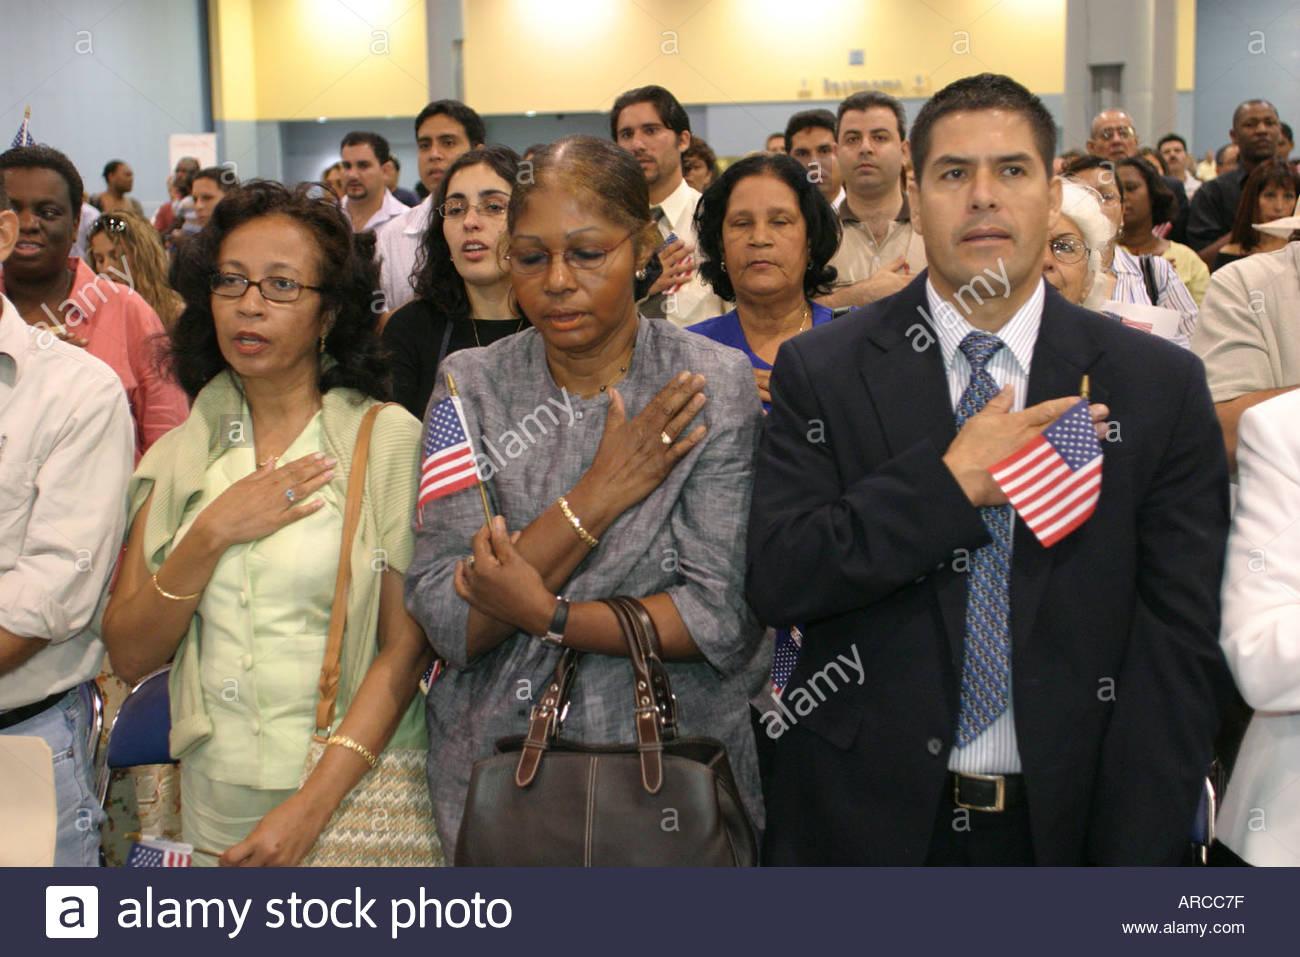 Miami Beach Florida naturalization ceremony oath of citizenship Pledge of Allegiance US flag - Stock Image